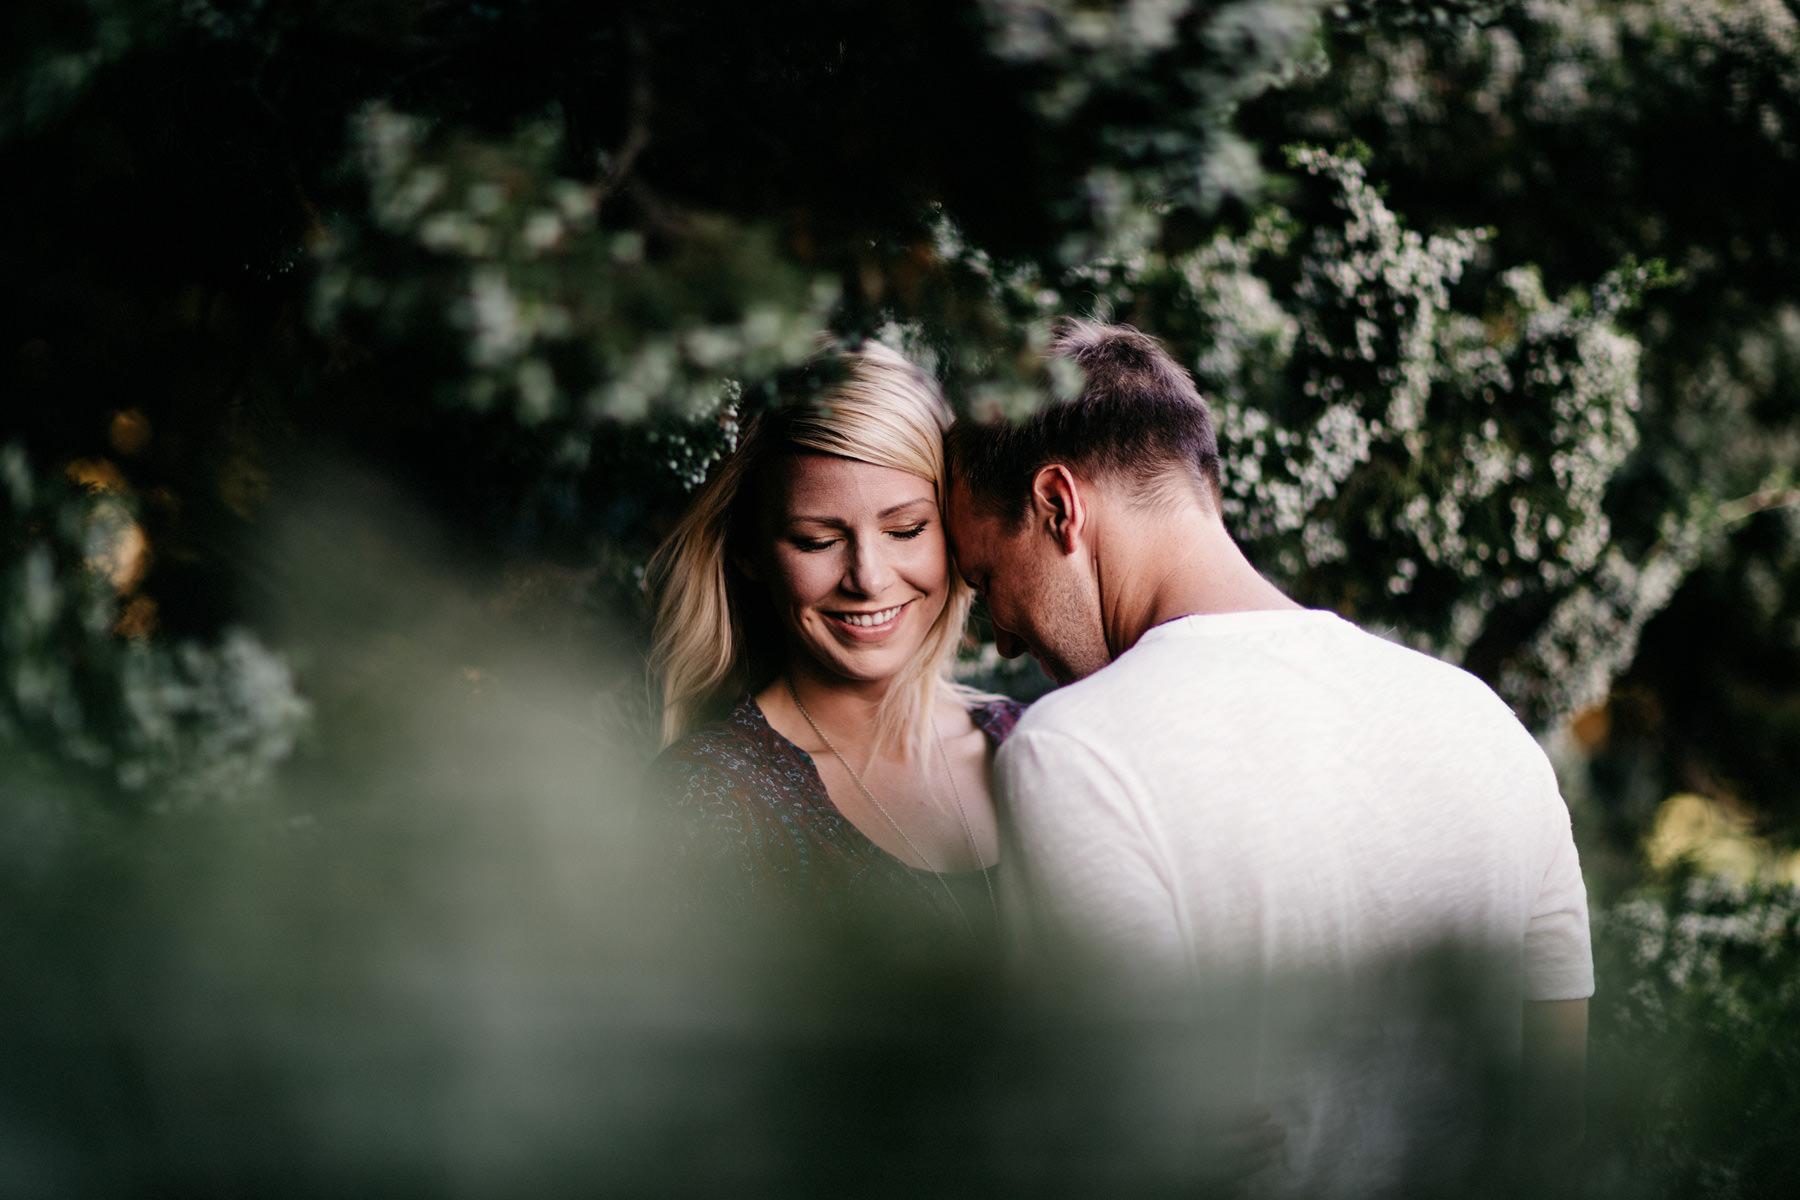 Shawnee Mission Park Engagement Session Kansas City_Kindling Wedding Photography_03.JPG